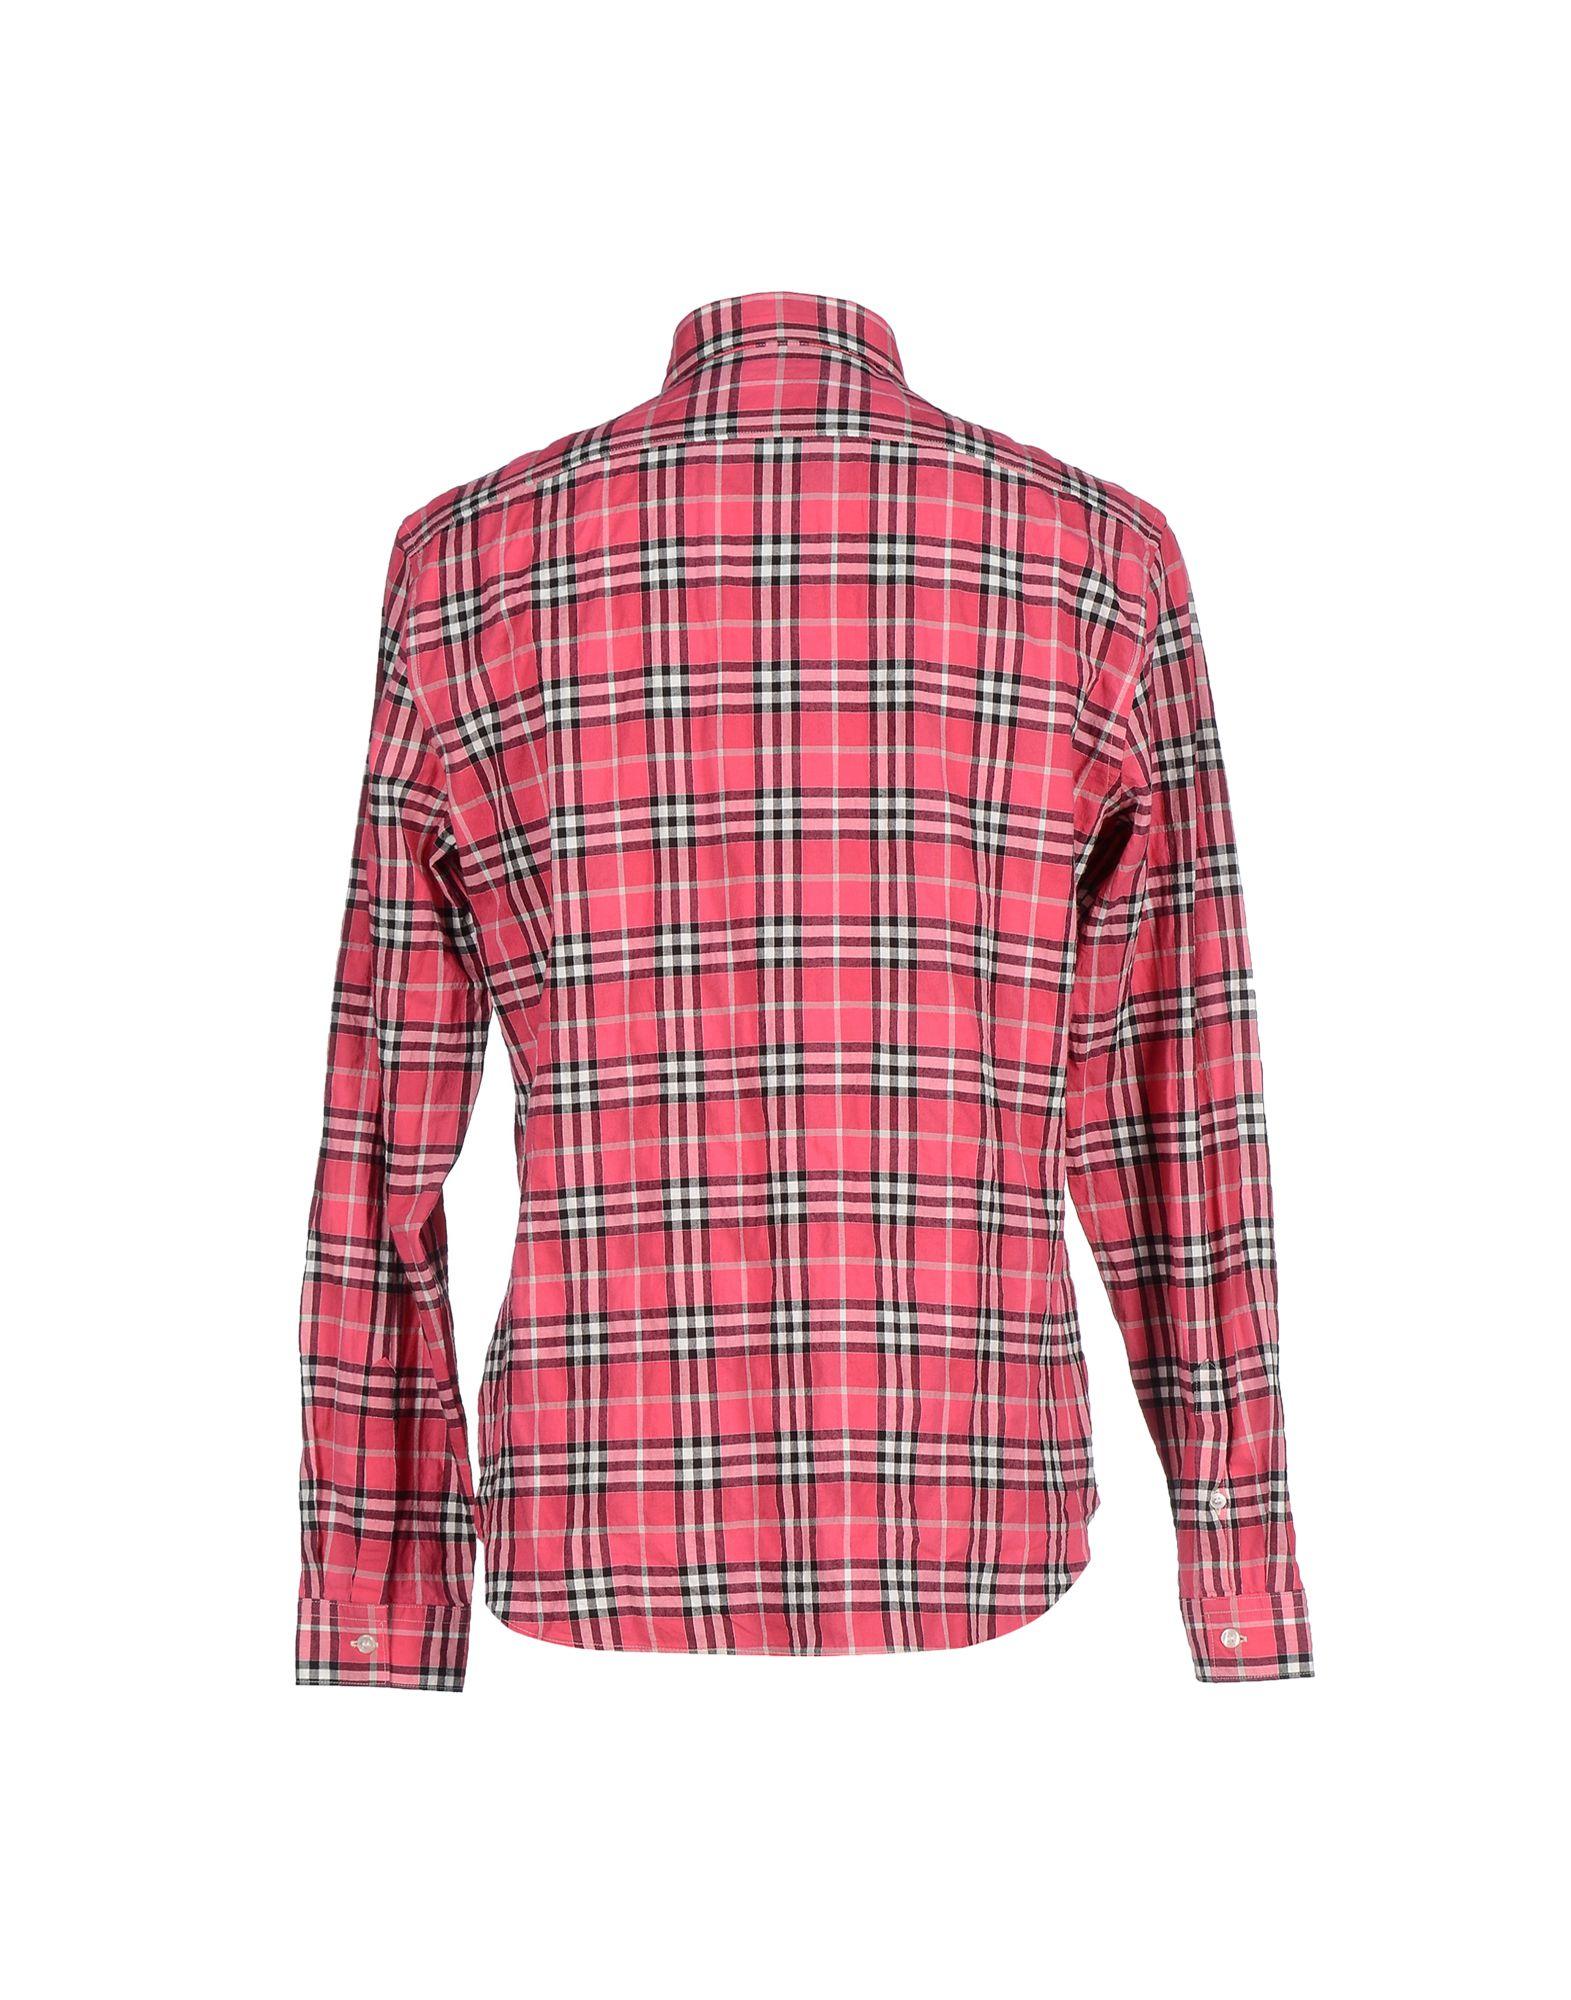 9cef7857b23b Burberry Brit Dress Shirt Men s